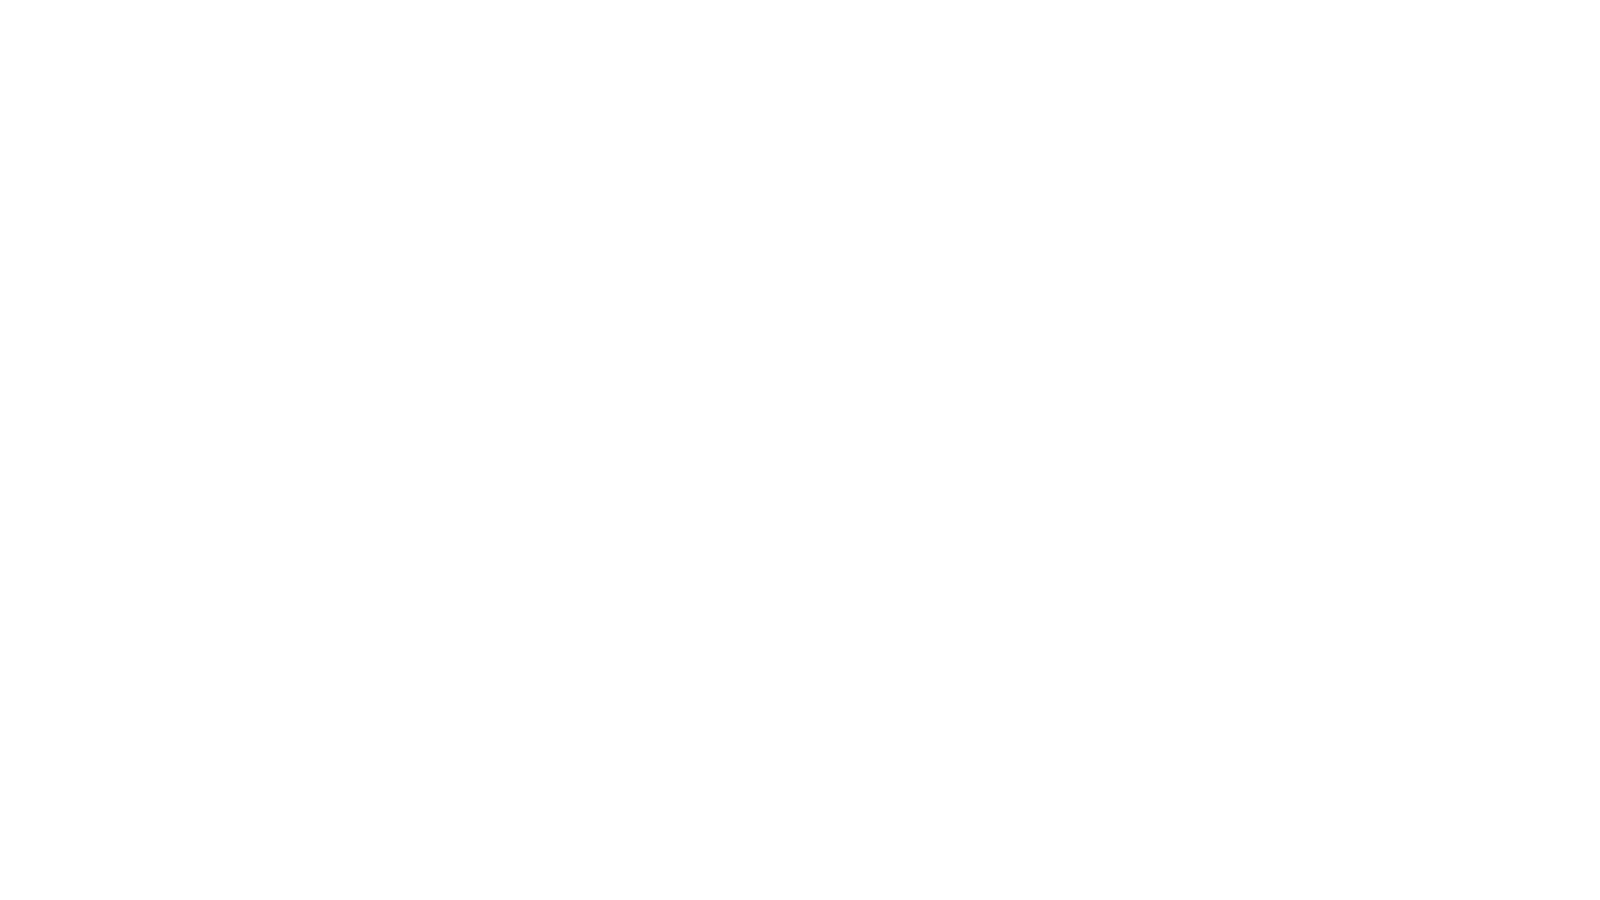 QAFL this Easter Saturday at Rococo Oval in Noosaville.  Pre match press conference Adam Bovalino (Noosa Coach) and Brett Maloney (Wilston Grange Coach)  Matches for Easter Saturday: Colts: 9.30am Reserves: 11.30am Seniors: 2pm  Check the official website for COVID 19 policy. noosatigers.com.au